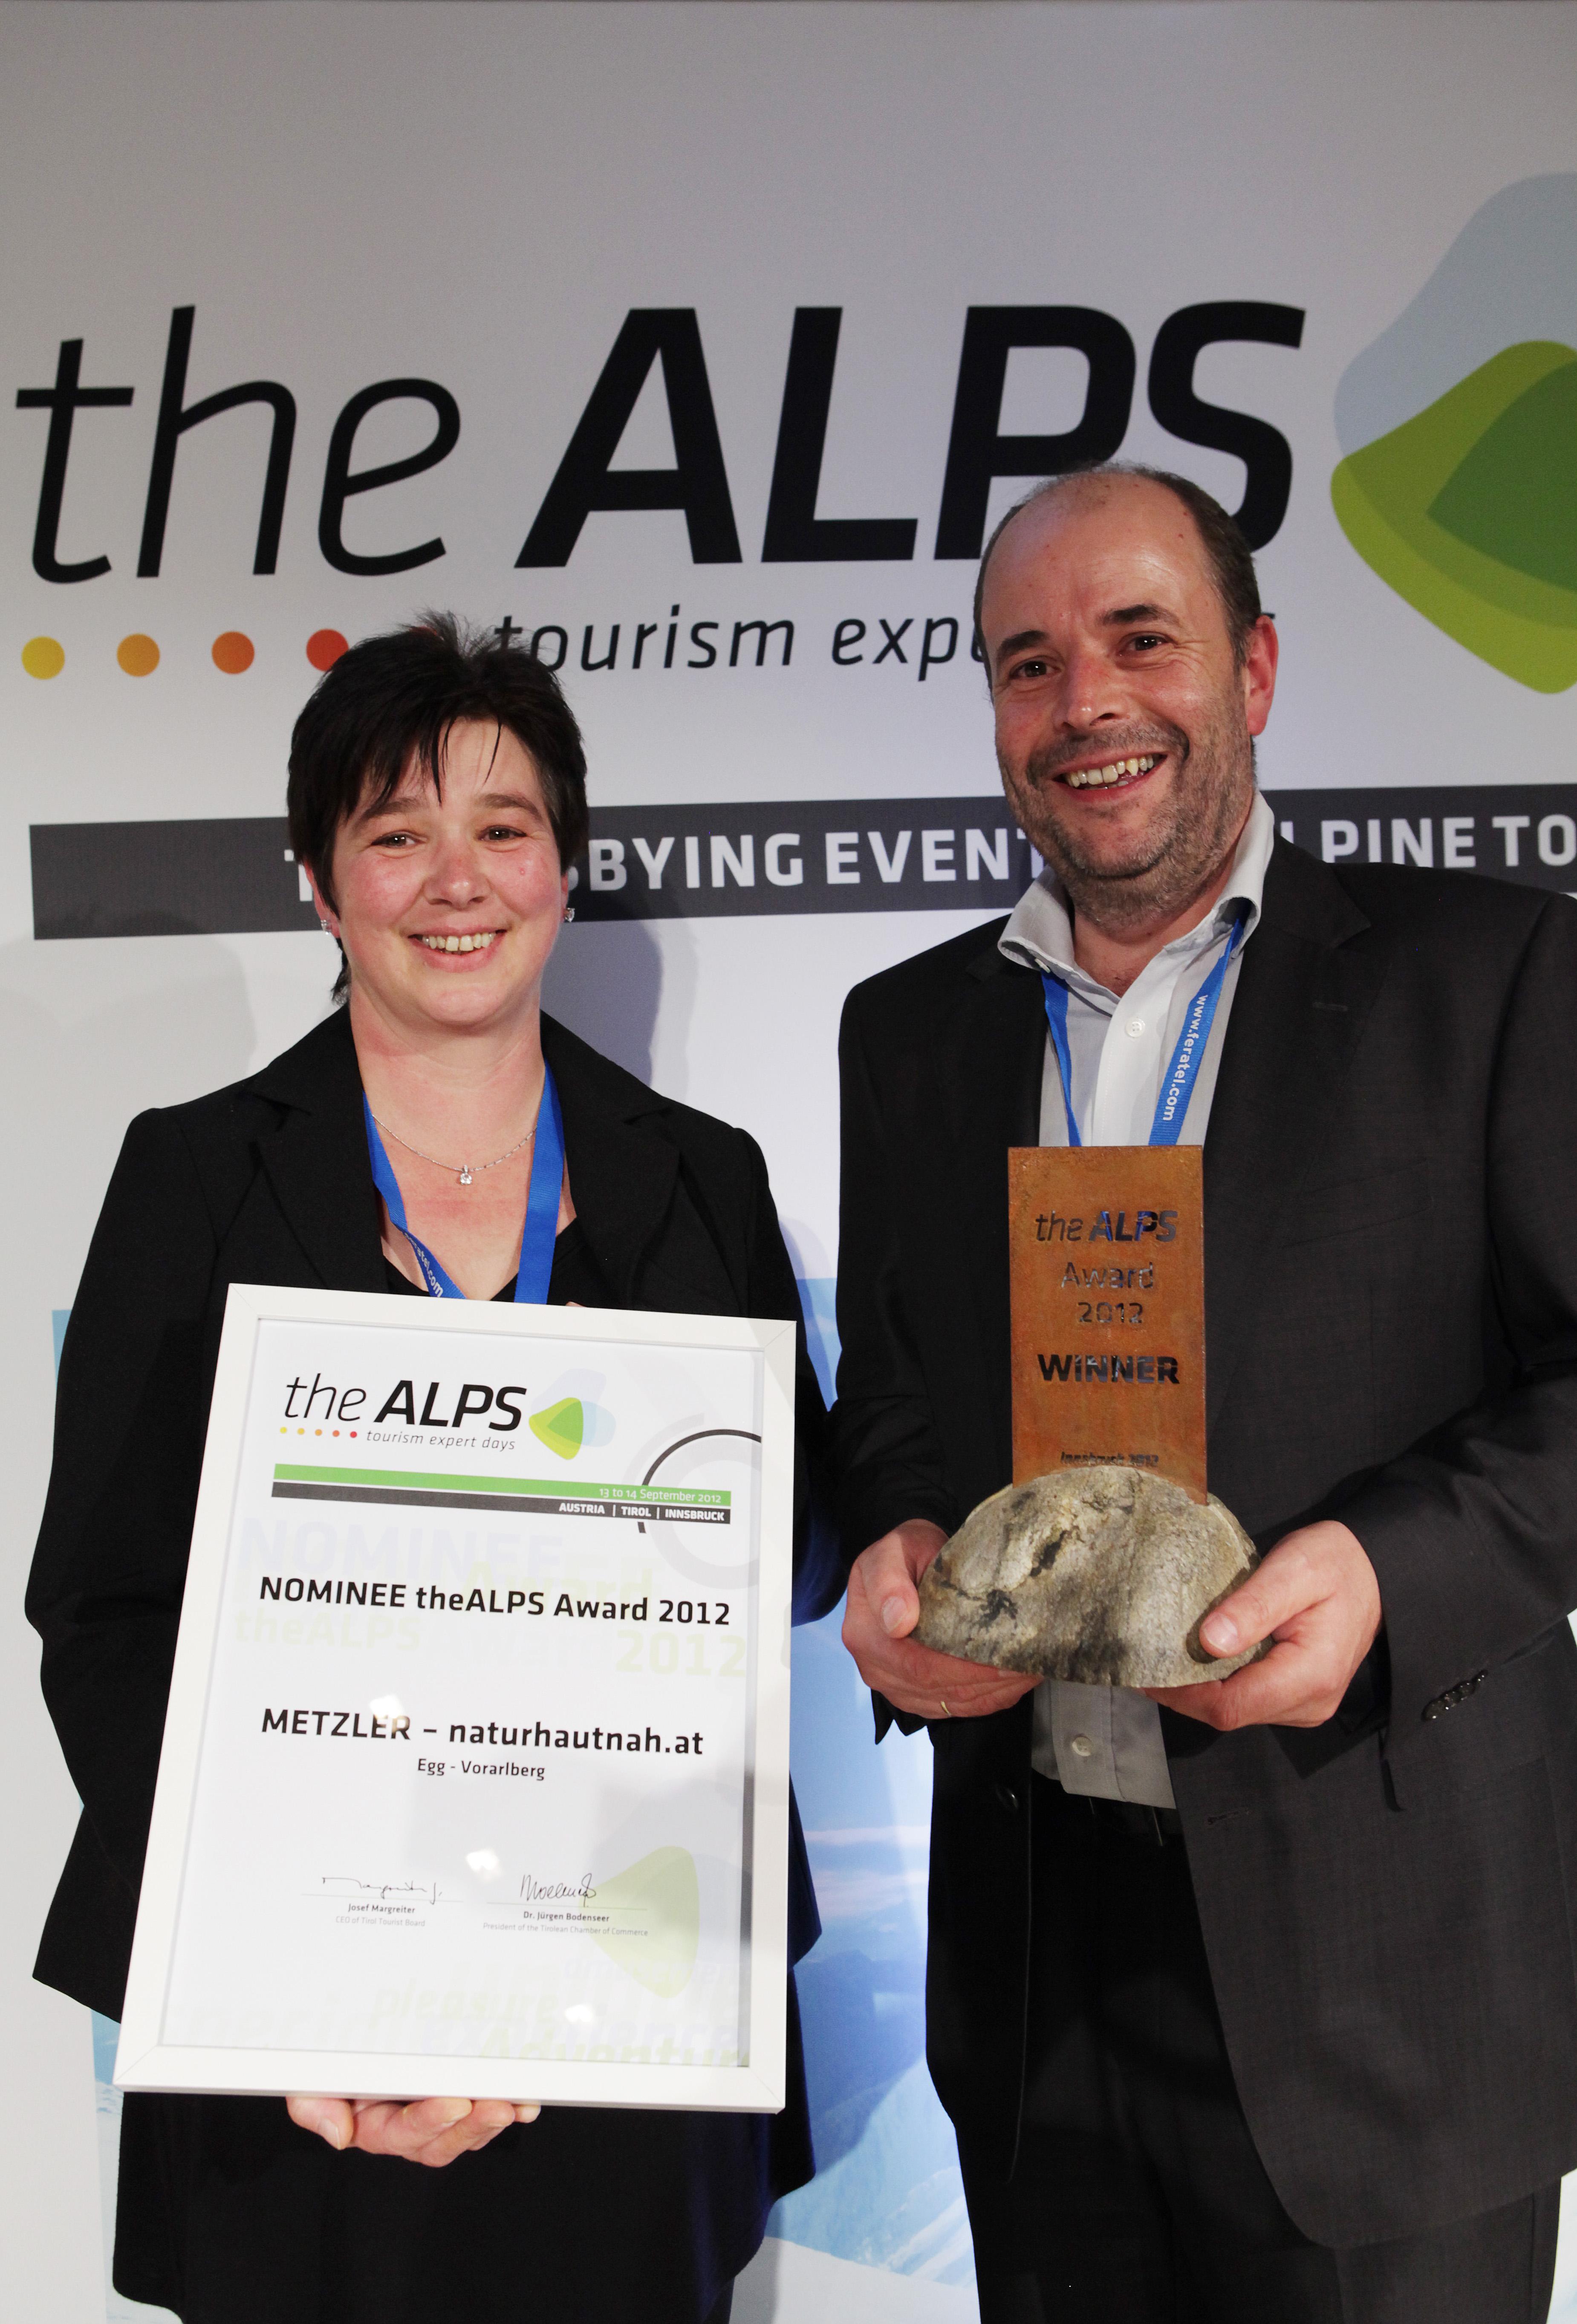 Stolze Preisträger des theALPS Award 2012 - Ingo und Melitta Metzler vom Vorarlberger Projekt naturhautnah.at